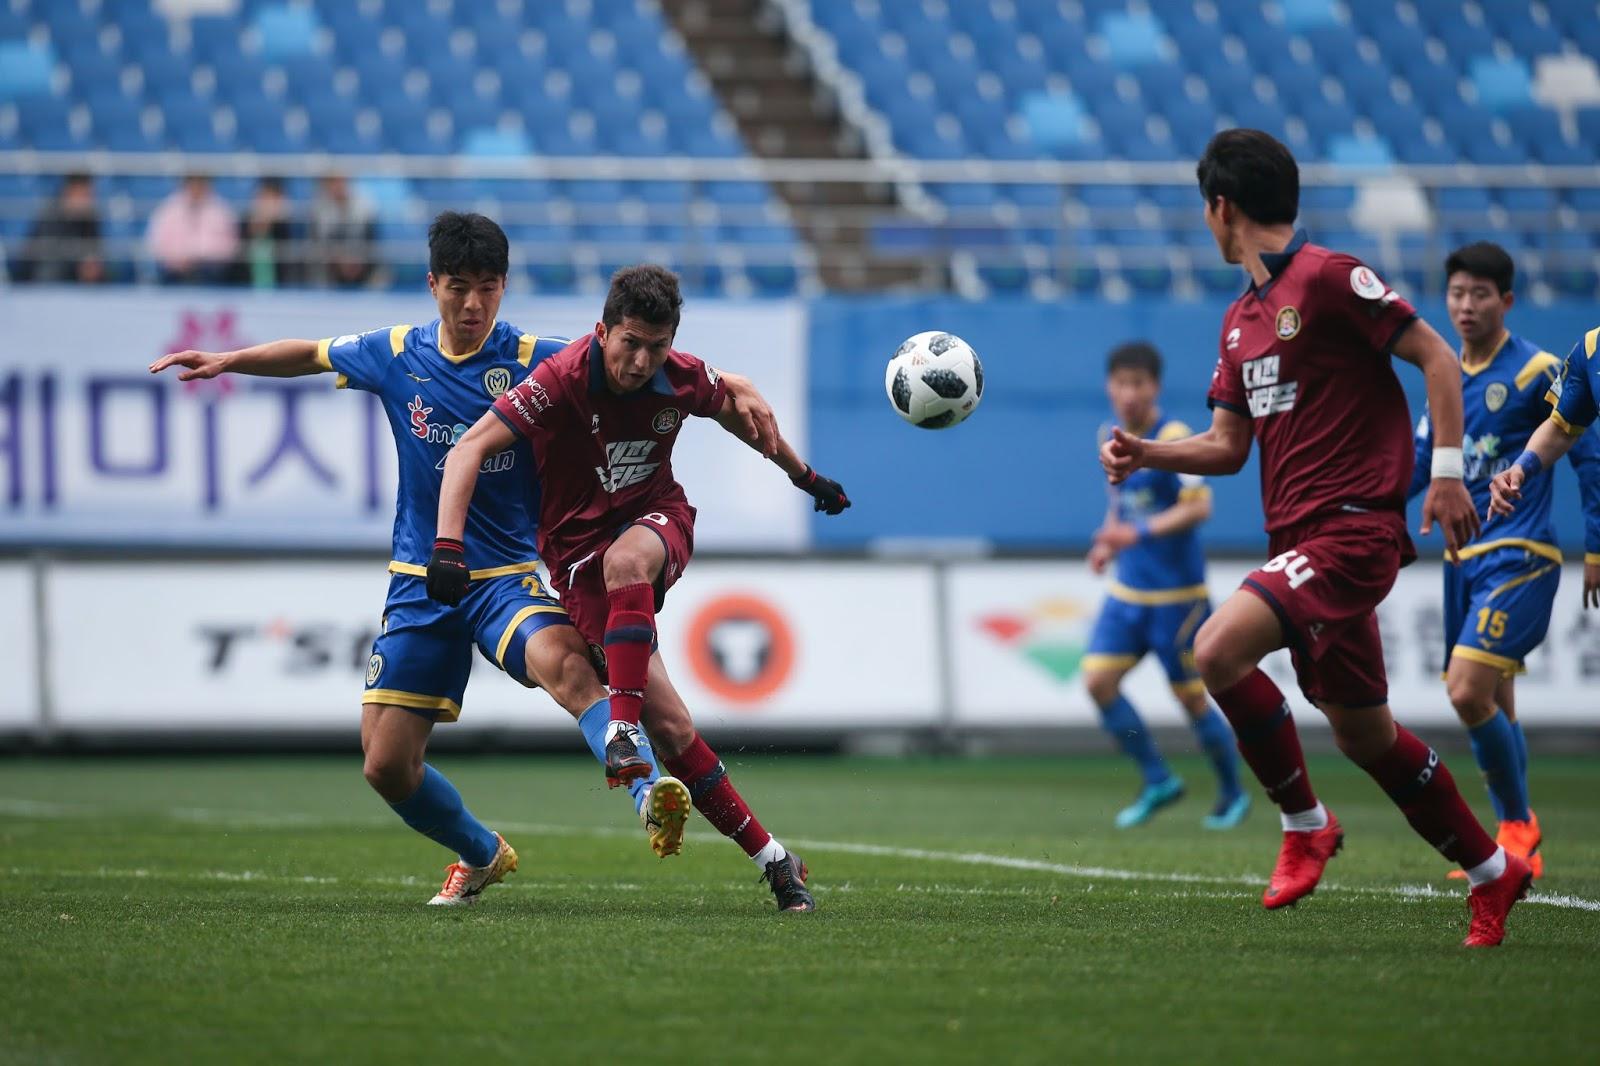 Preview: Daejeon Citizen vs Seongnam FC in K League 2